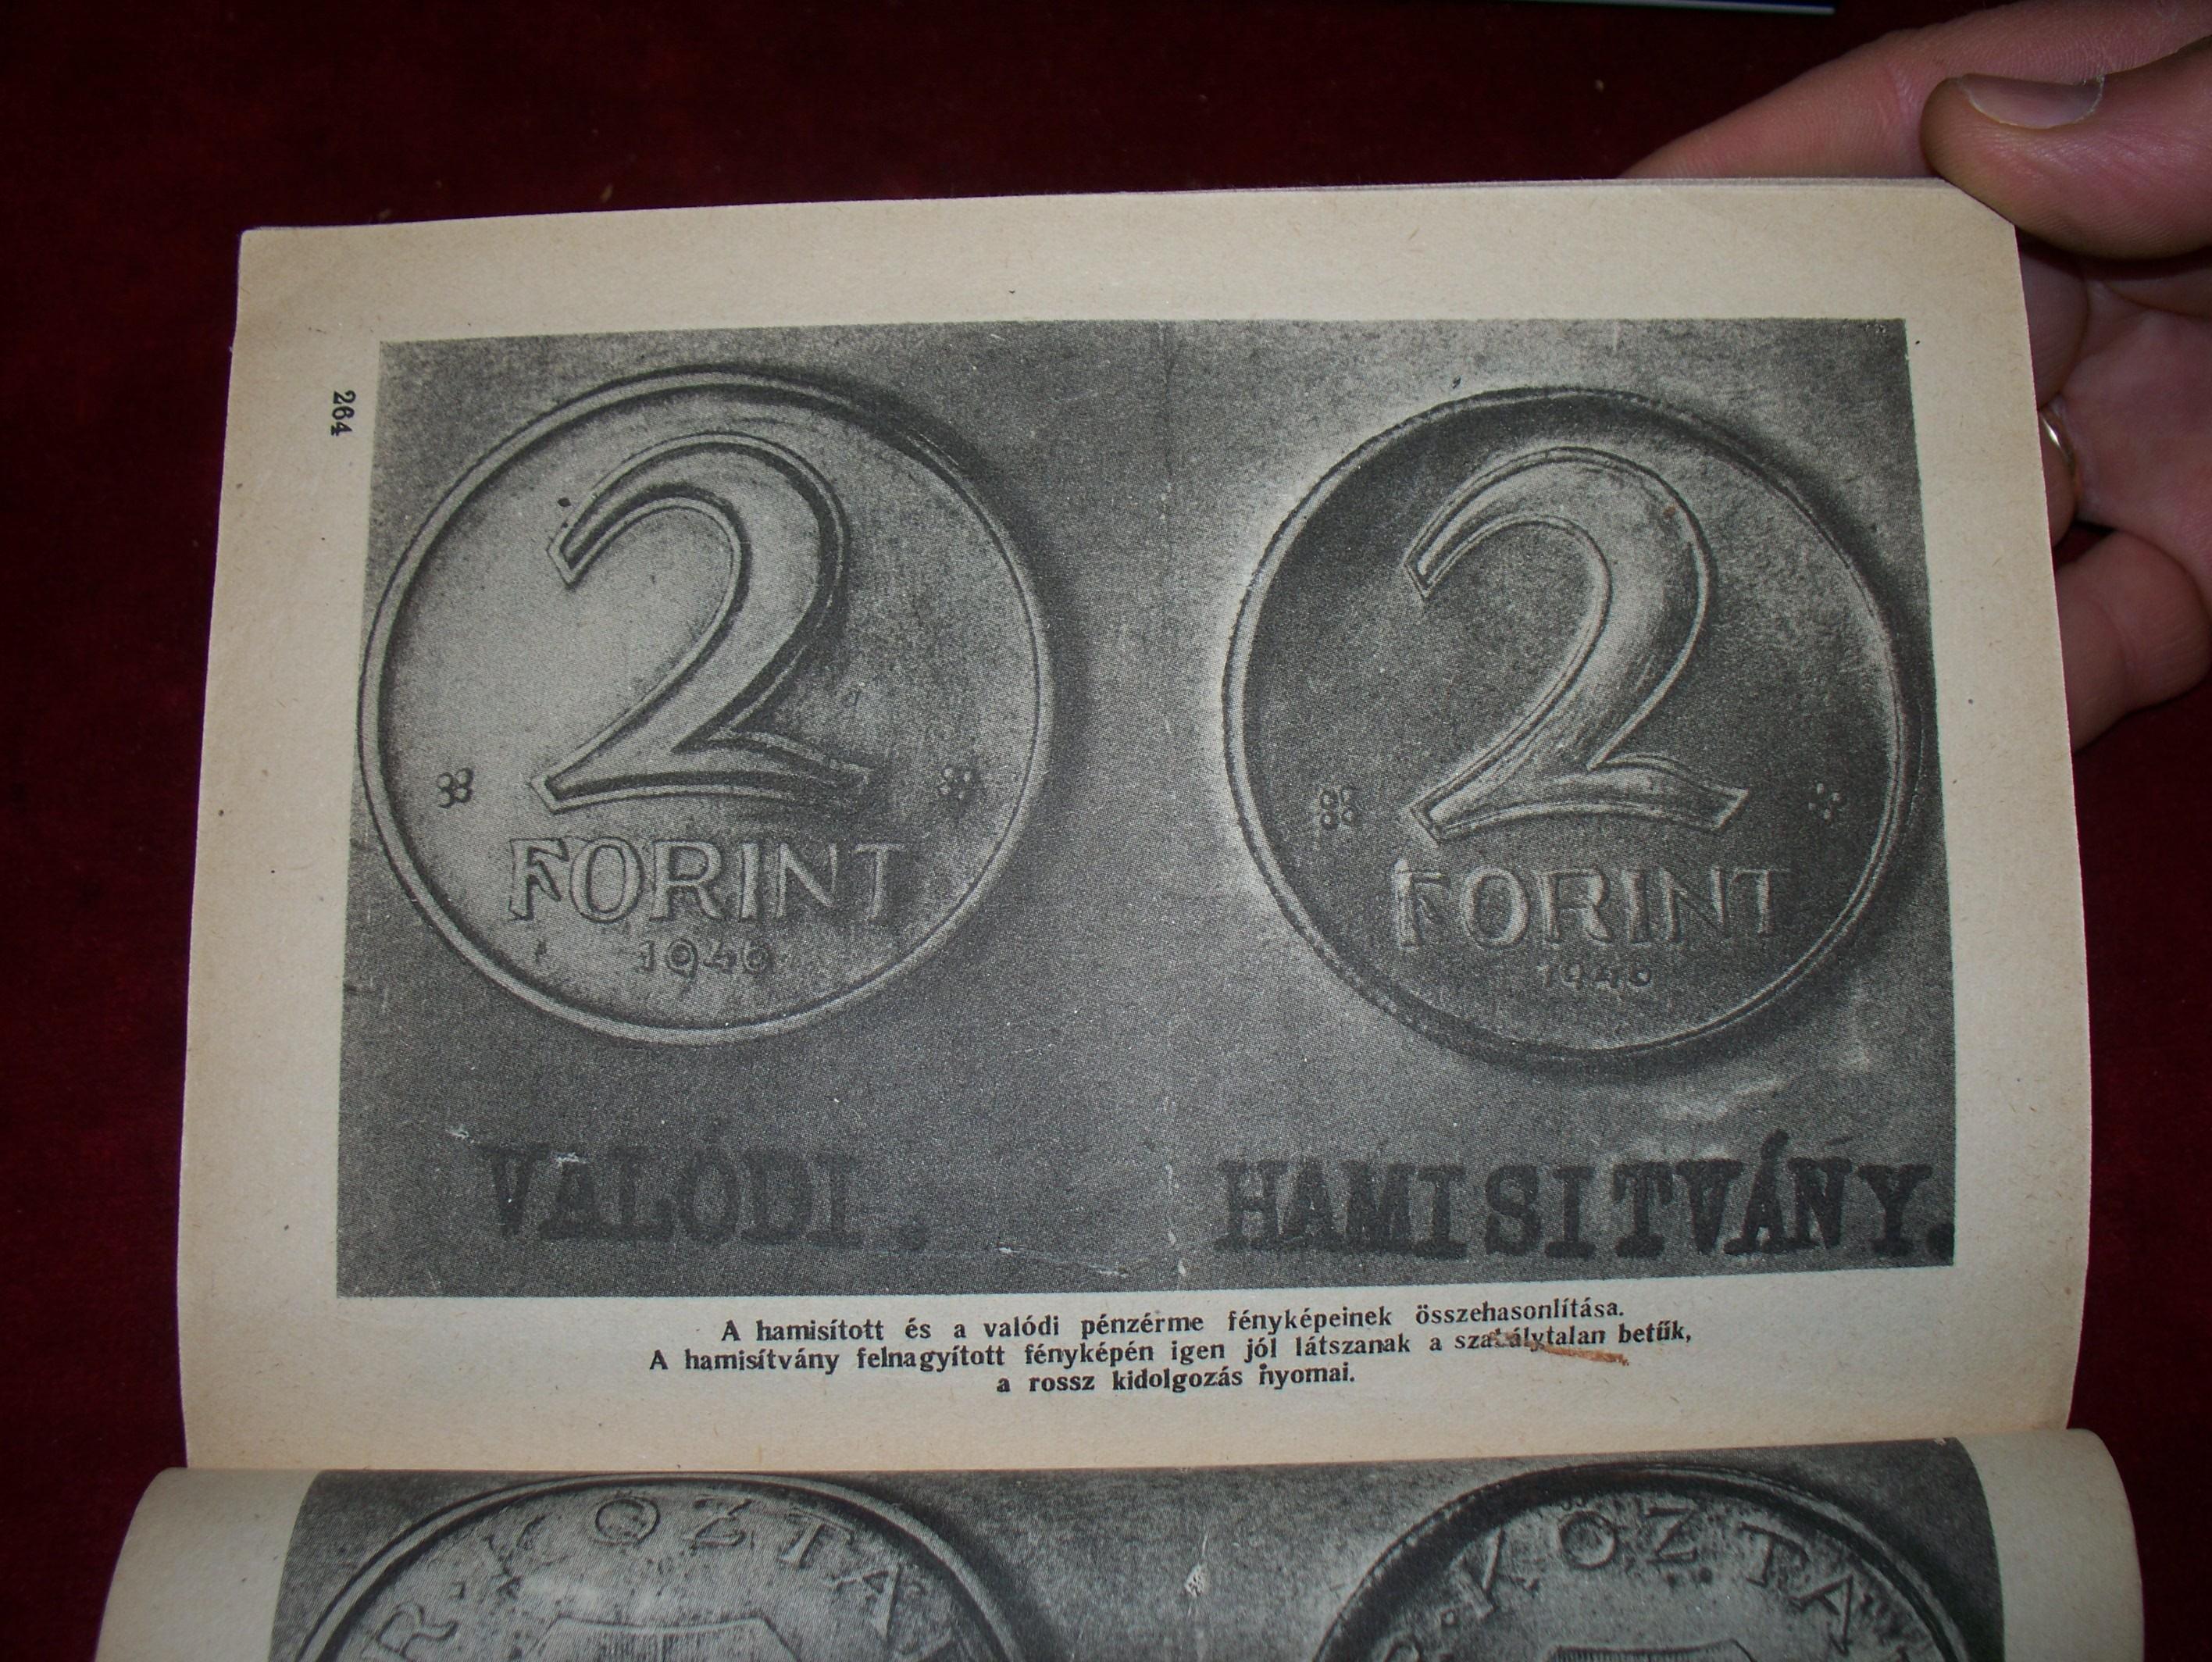 http://www.forintportal.hu/hirek/1946-os-2-forint-eredeti-es-az-artex-utanveret/1946-os-2-forint-eredeti-es-az-artex-utanveret_buncselekmenyek_nyomai_kriminaltechnika_1950_nagy.jpg